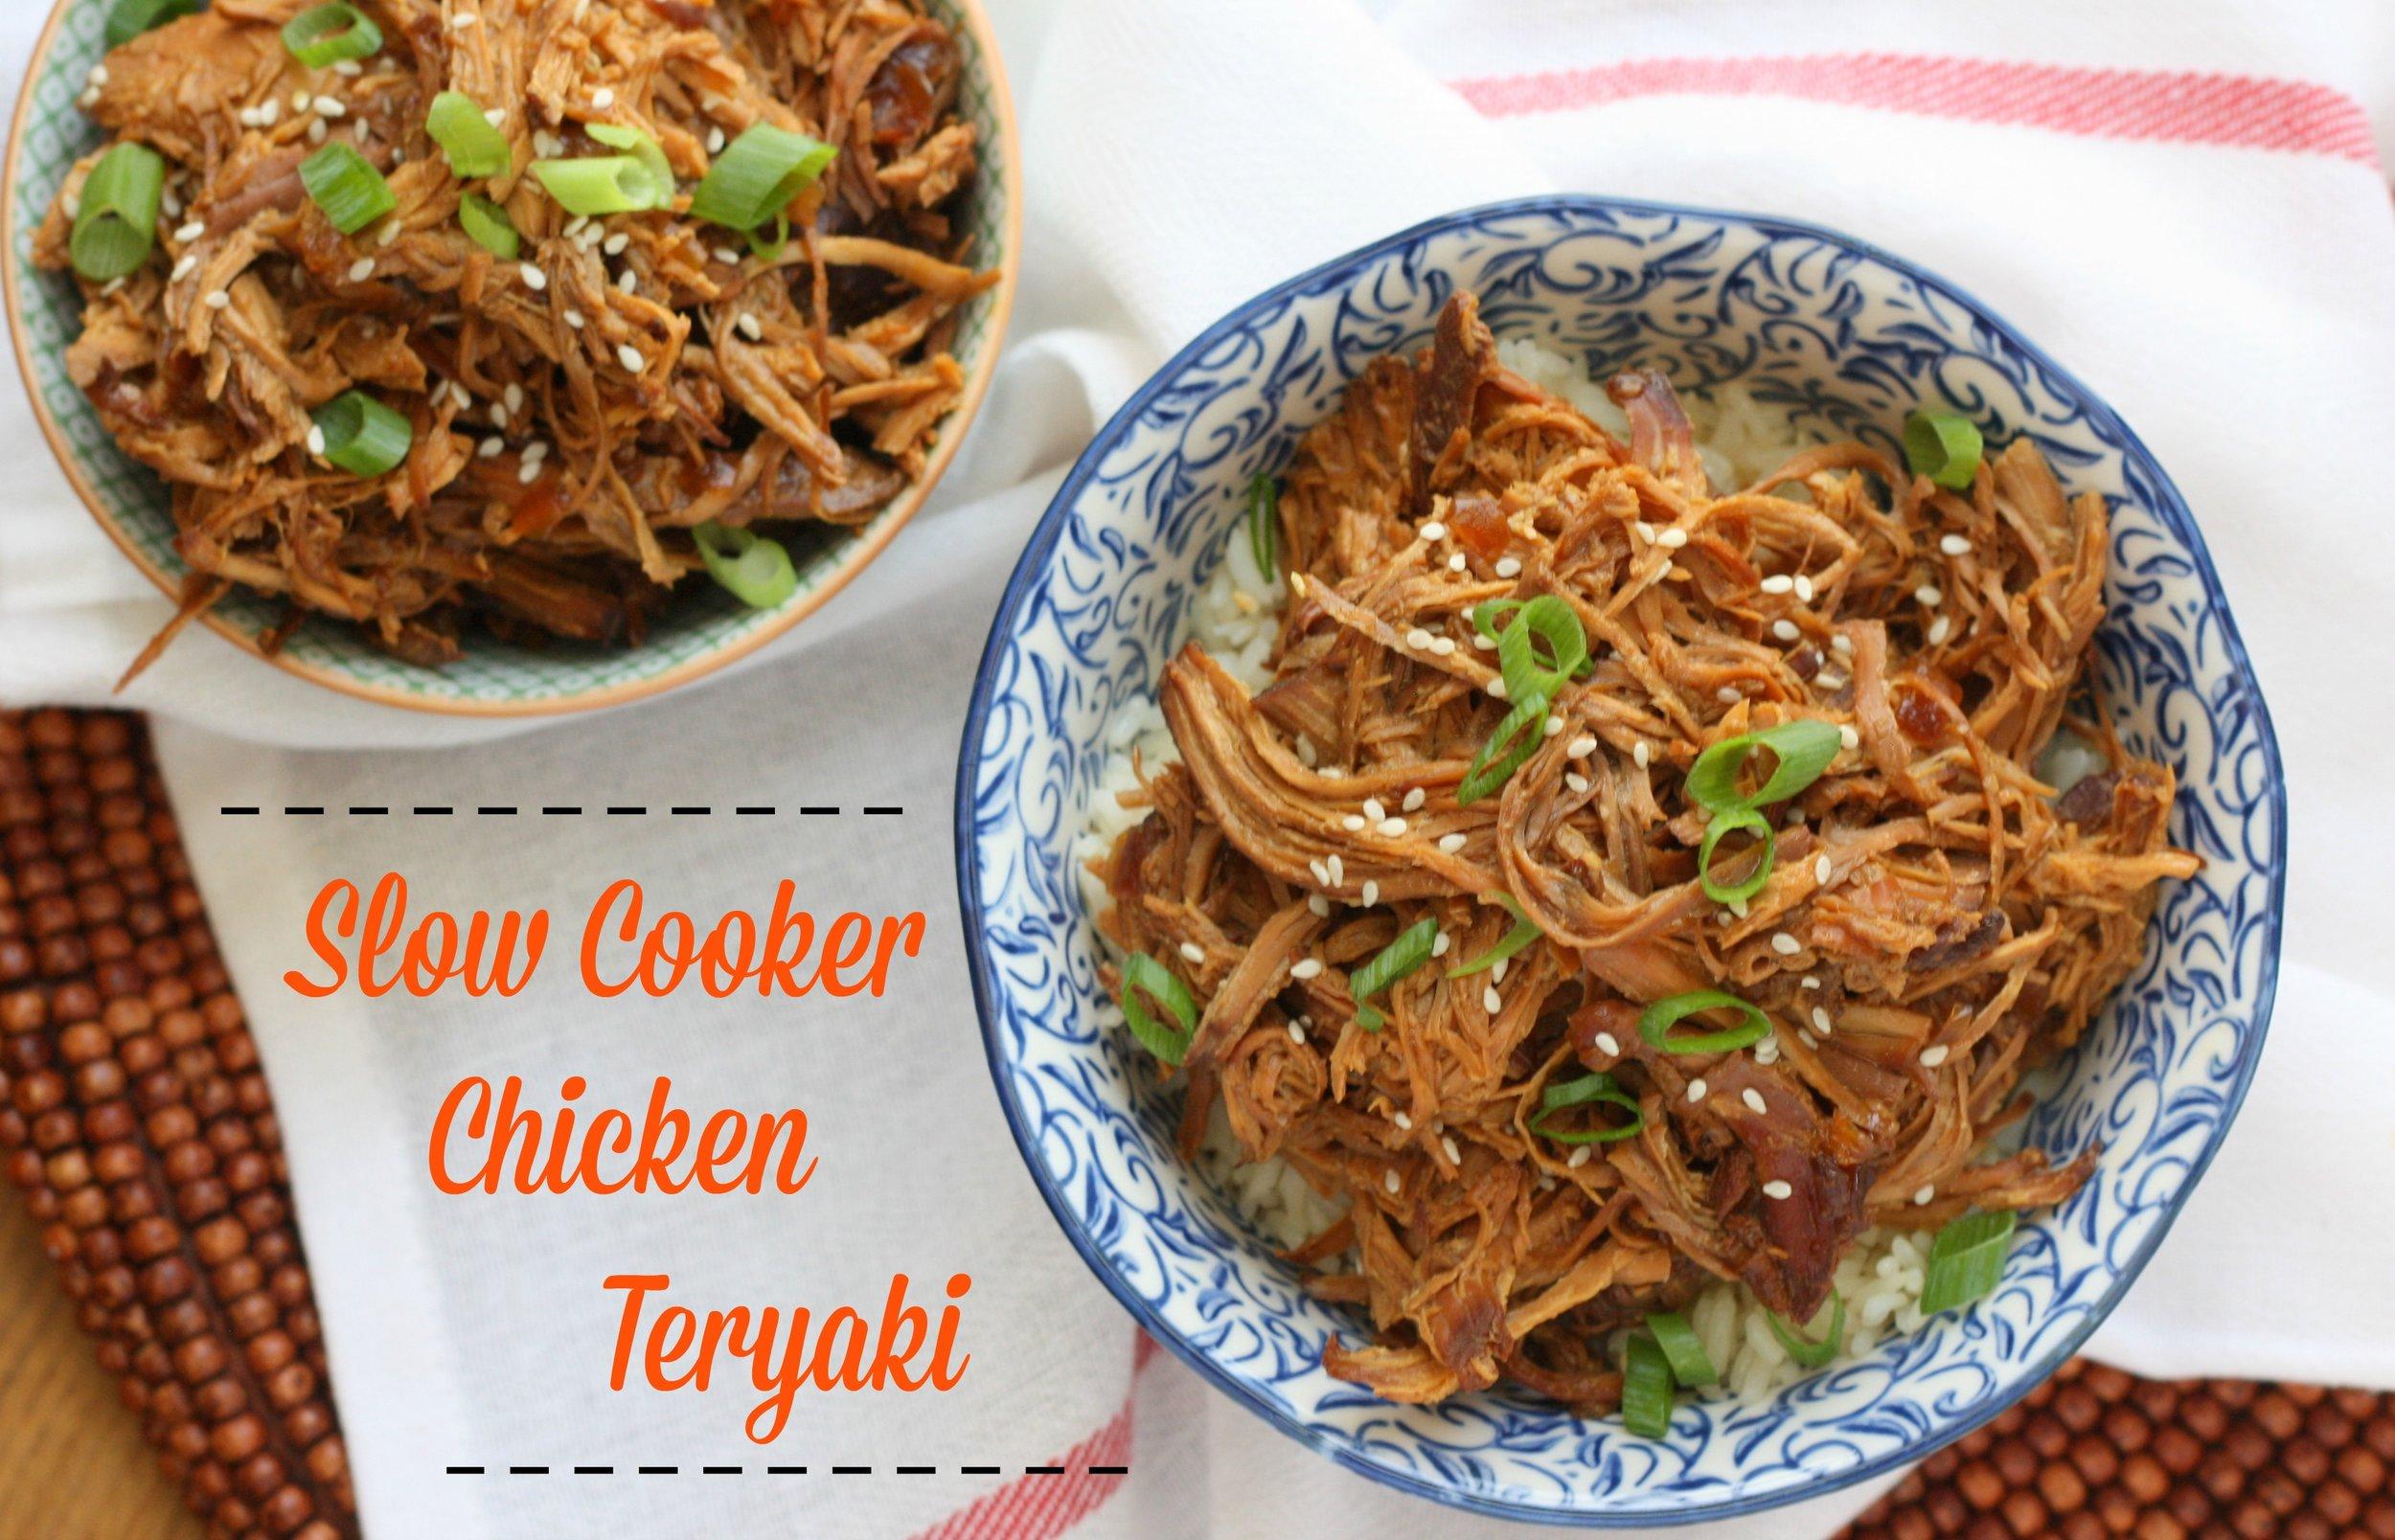 Slow Cooker Chicken Teryaki1-text.jpg